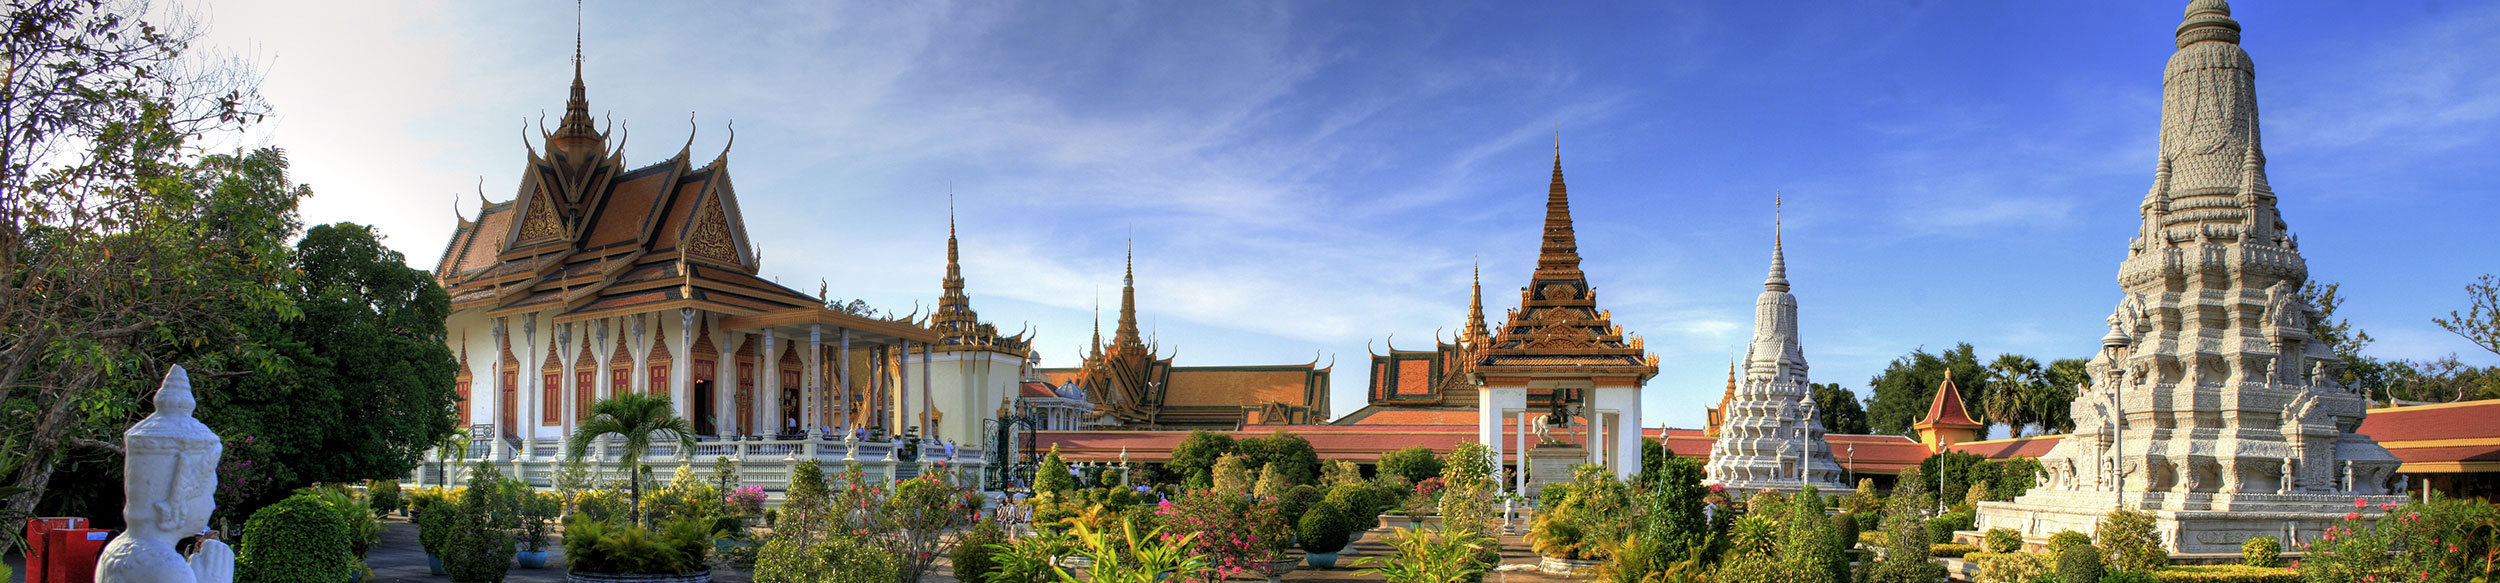 Visiter Phnom Penh avec Carnets d'Asie